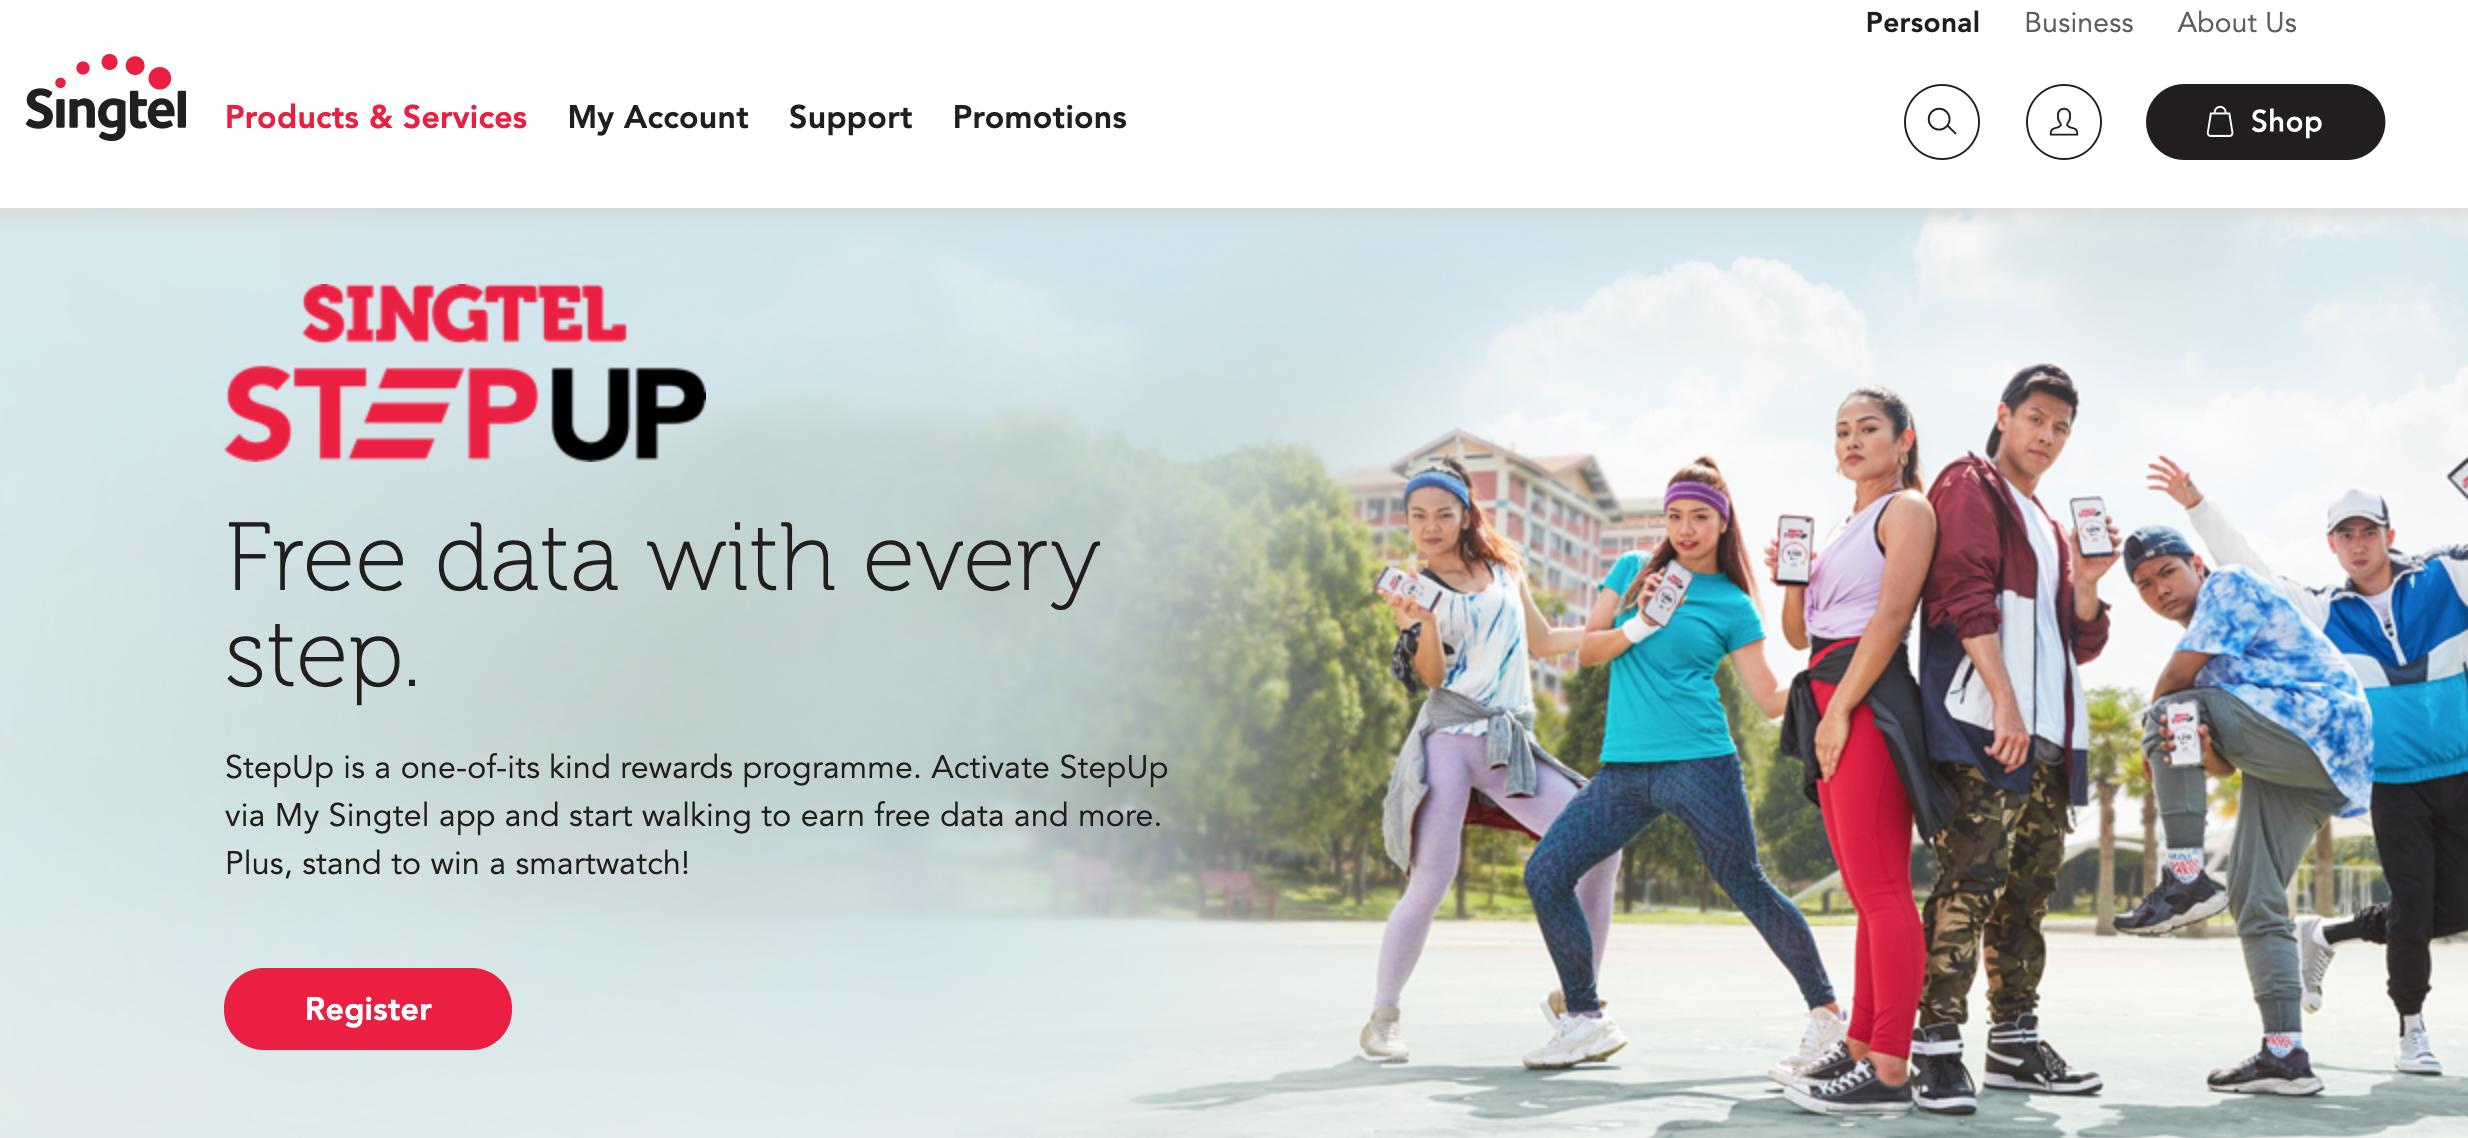 Singtel and AIA Introduce StepUp